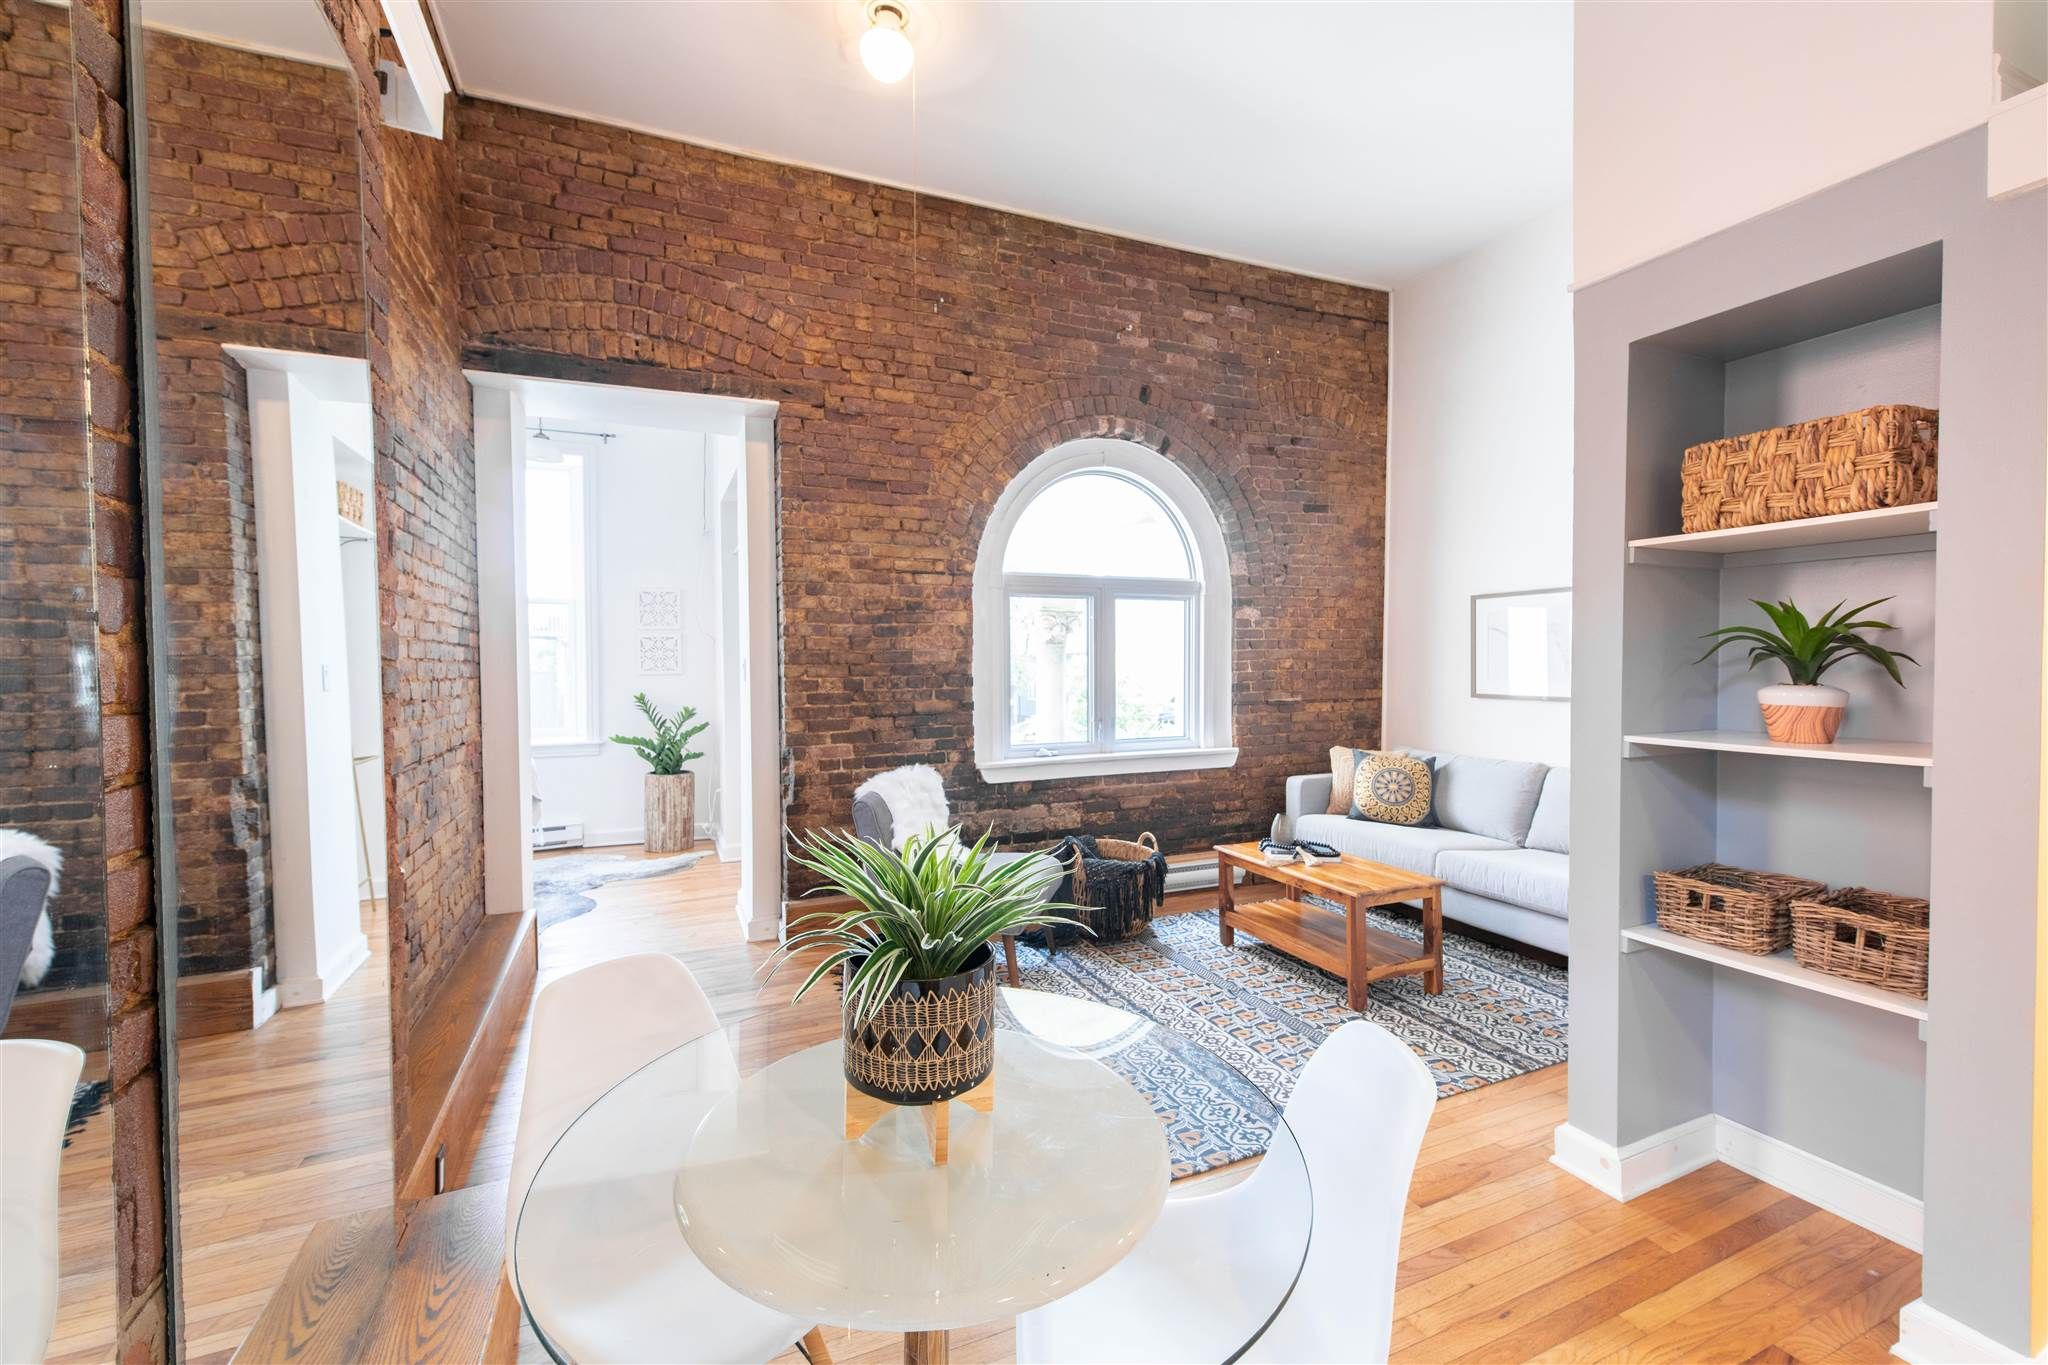 Main Photo: 1 2128 Brunswick Street in Halifax: 1-Halifax Central Residential for sale (Halifax-Dartmouth)  : MLS®# 202118007